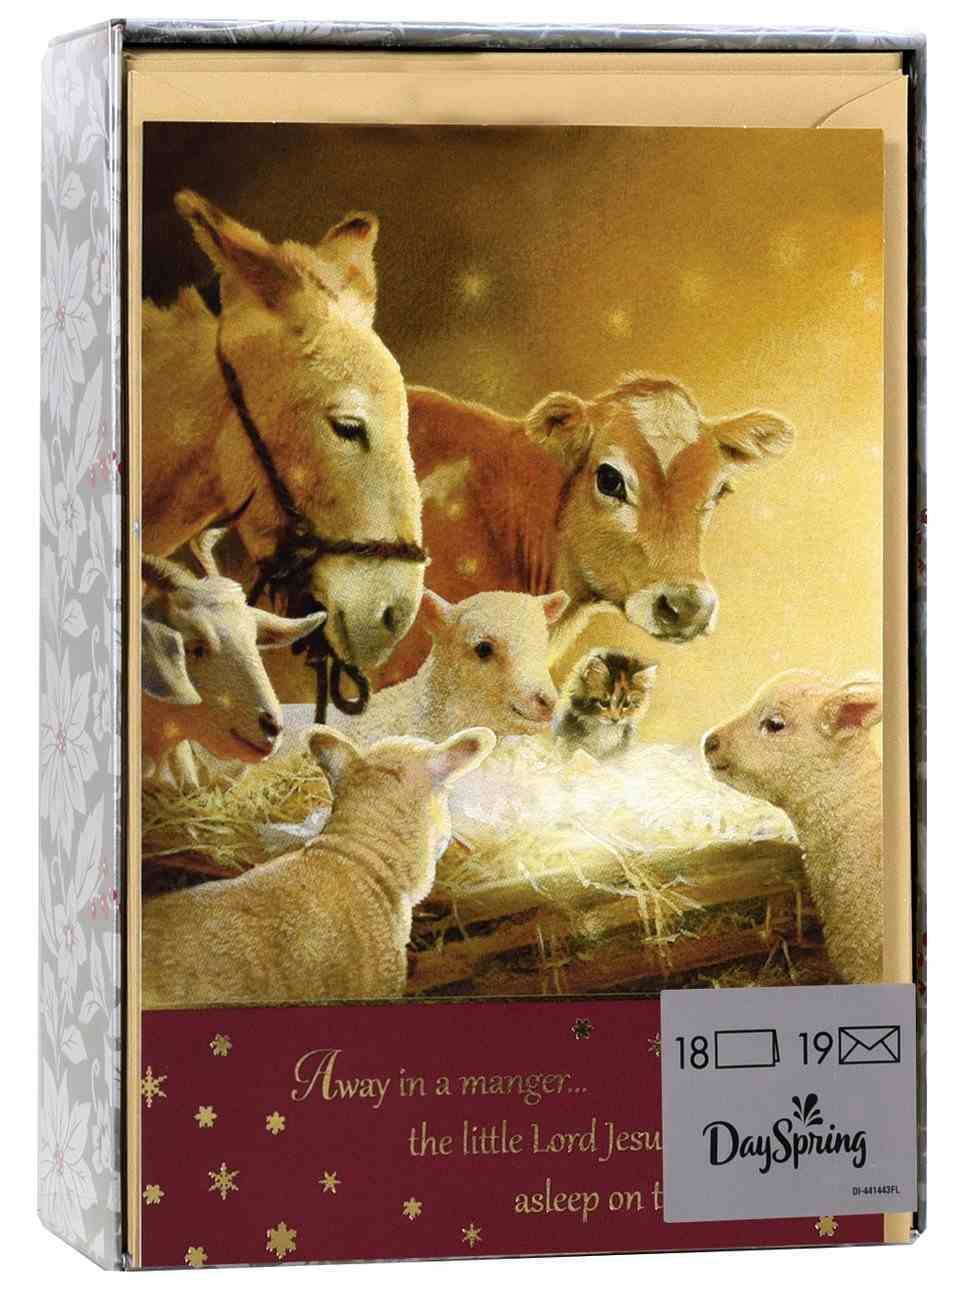 Christmas Boxed Cards: Away in a Manger Animals (Luke 2:11 Nlt) Box